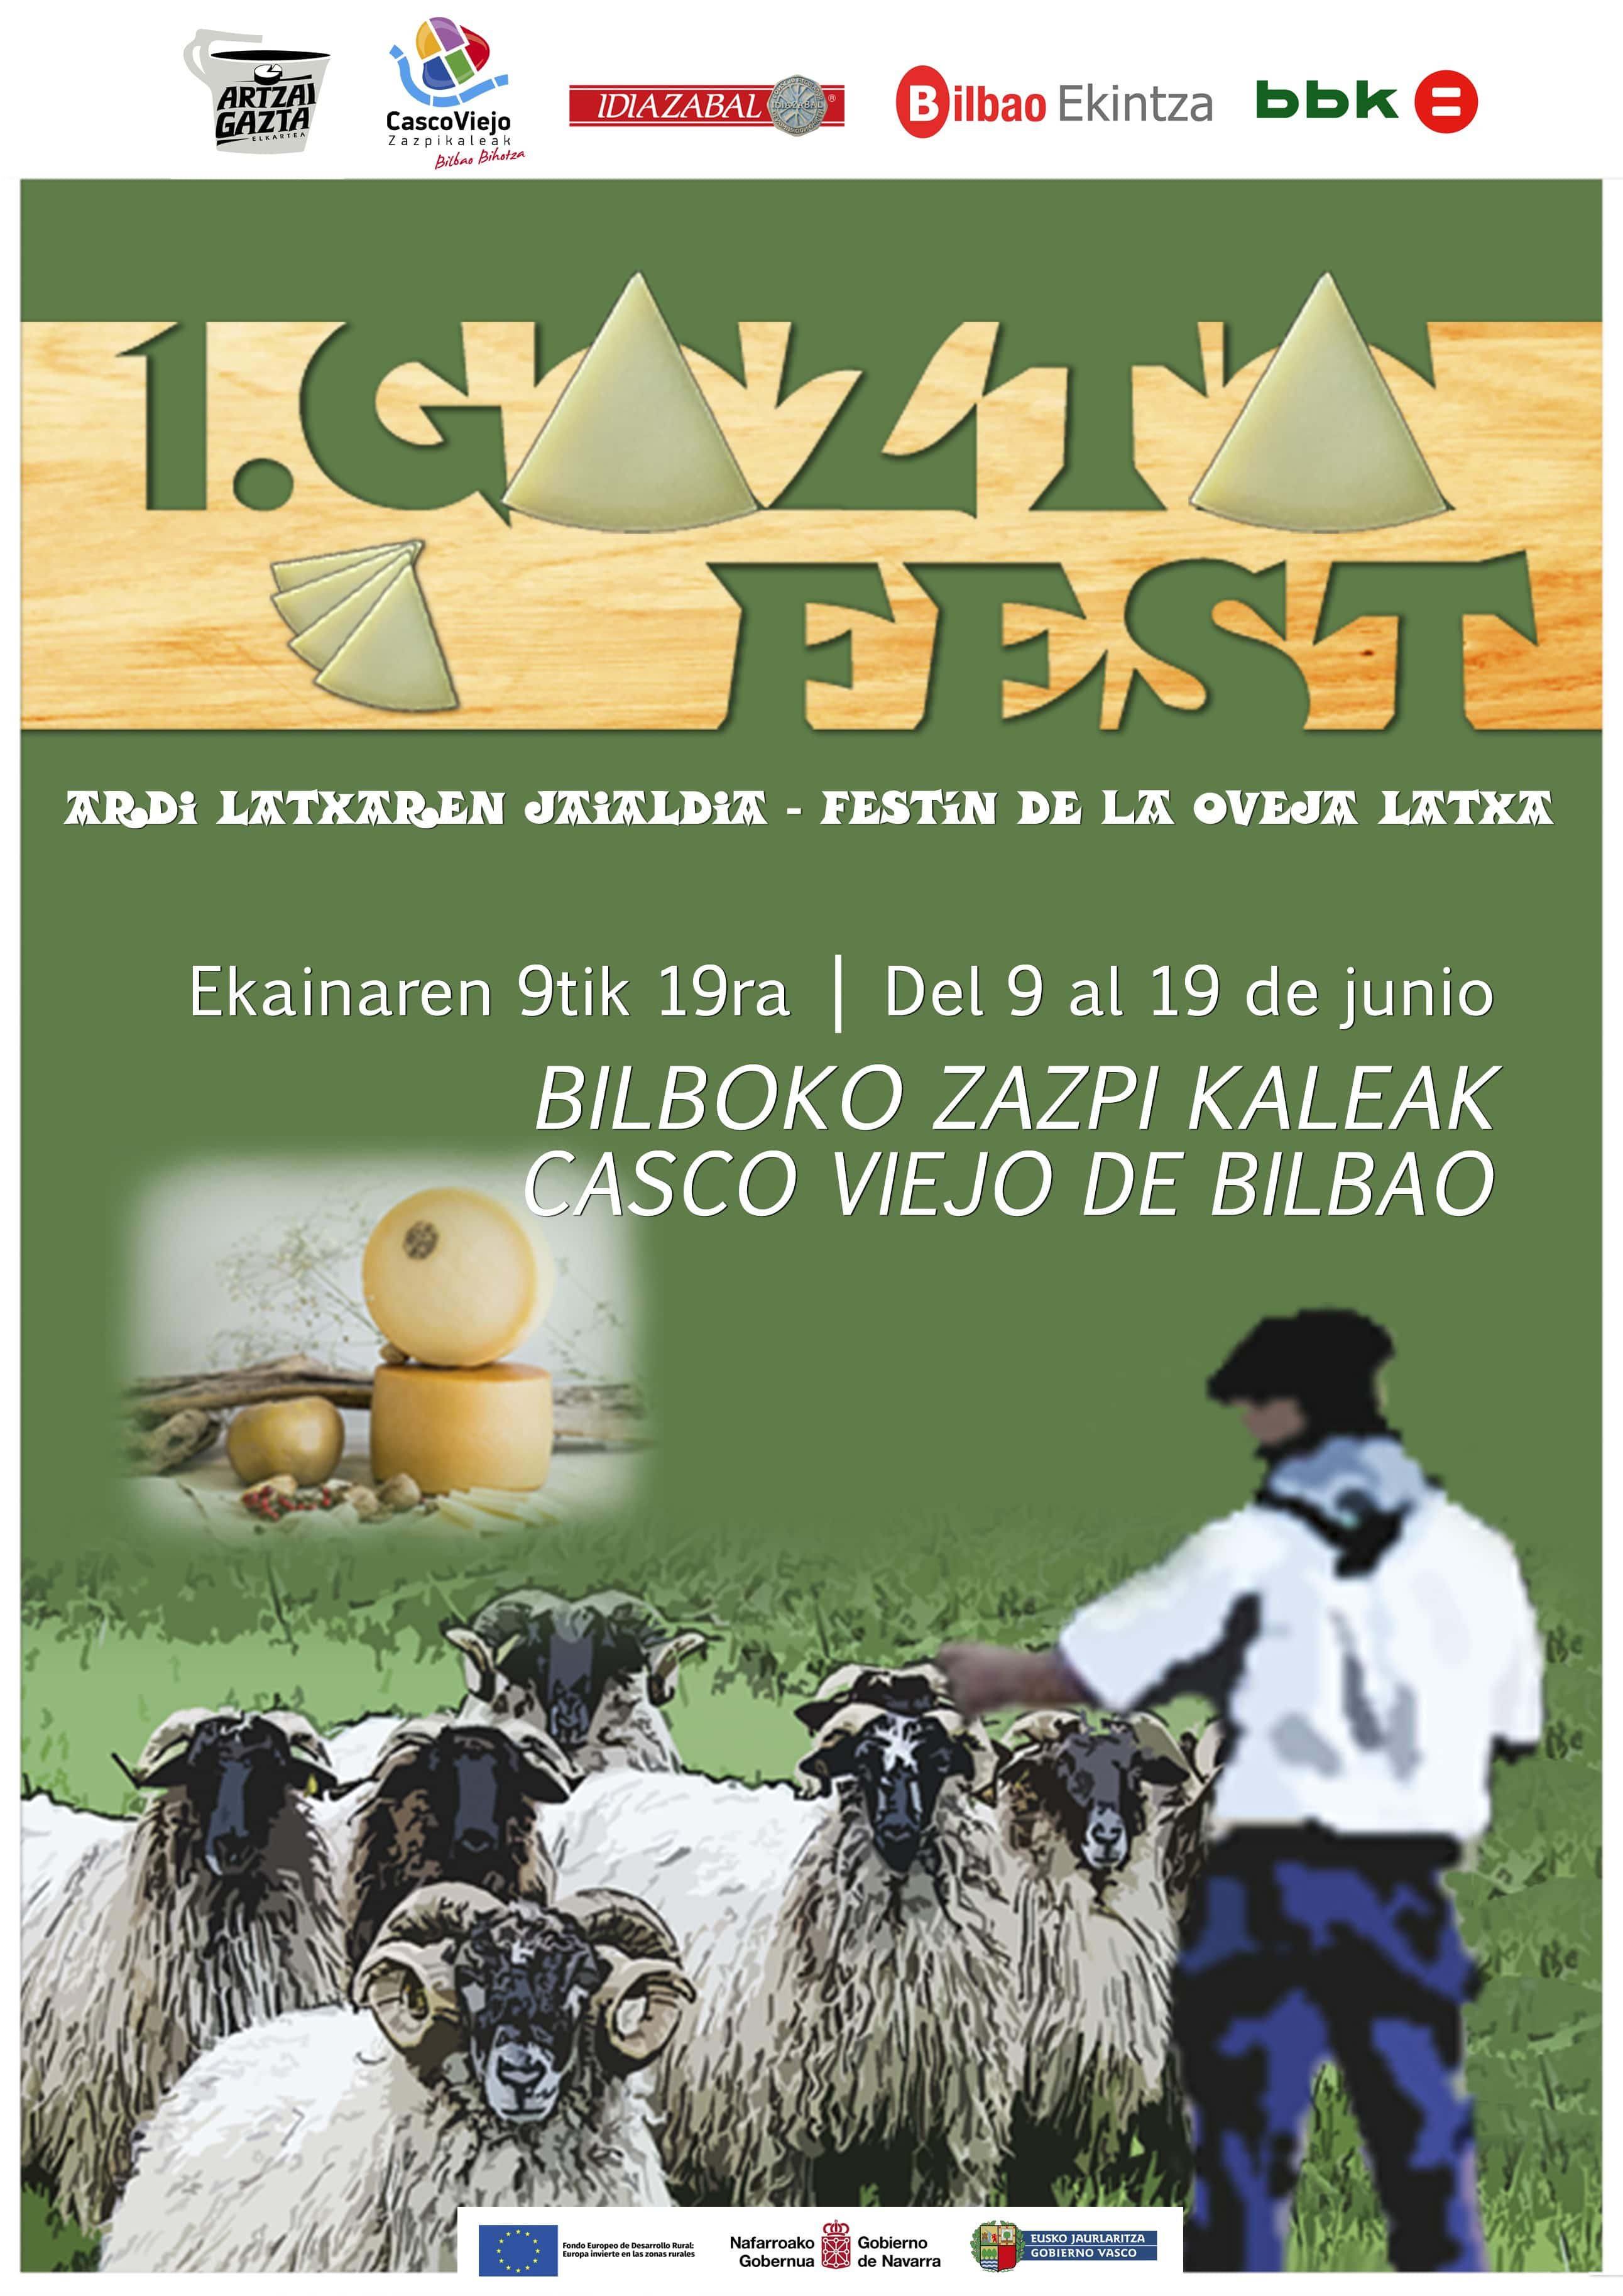 I GAZTA FEST CASCO VIEJO DE BILBAO